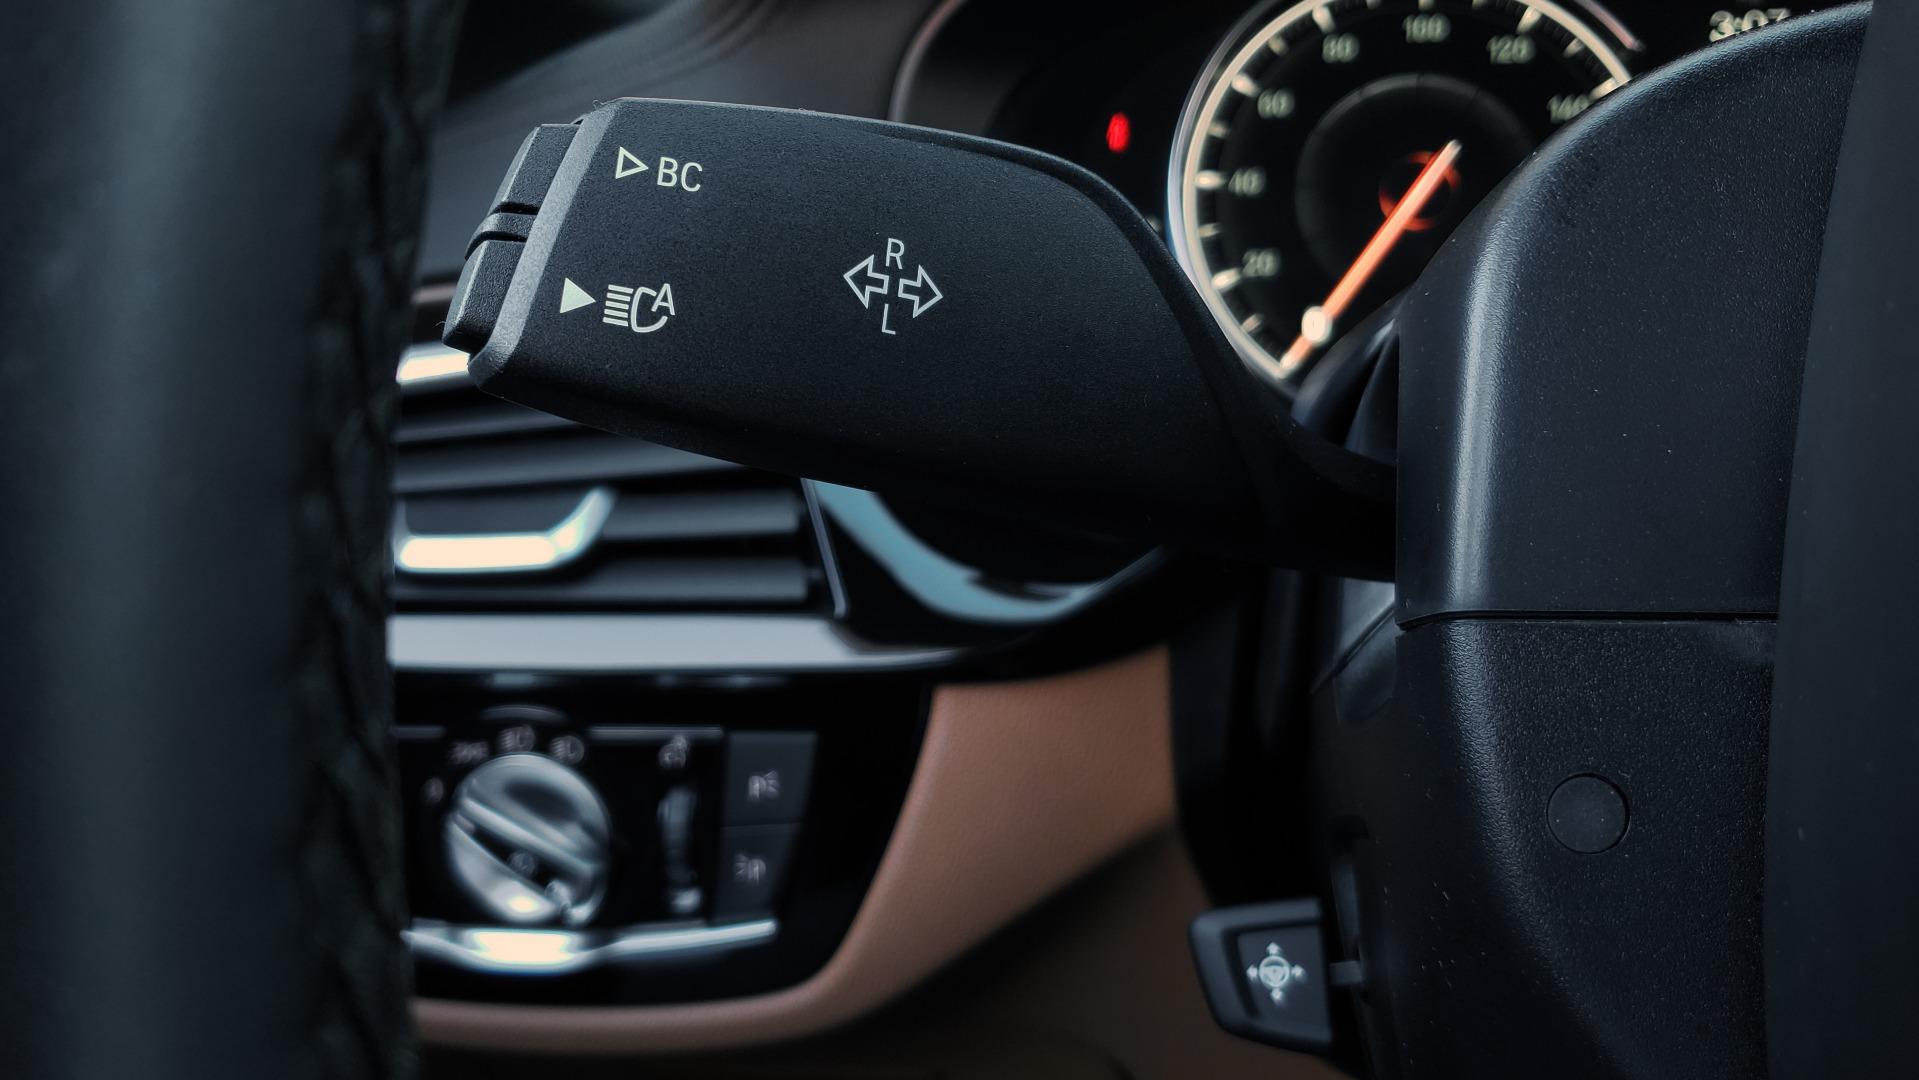 Used 2018 BMW 5 SERIES 540I M-SPORT / DRVR ASST / EXEC PKG / NAV / SUNROOF / HUD / REARVIEW for sale Sold at Formula Imports in Charlotte NC 28227 43